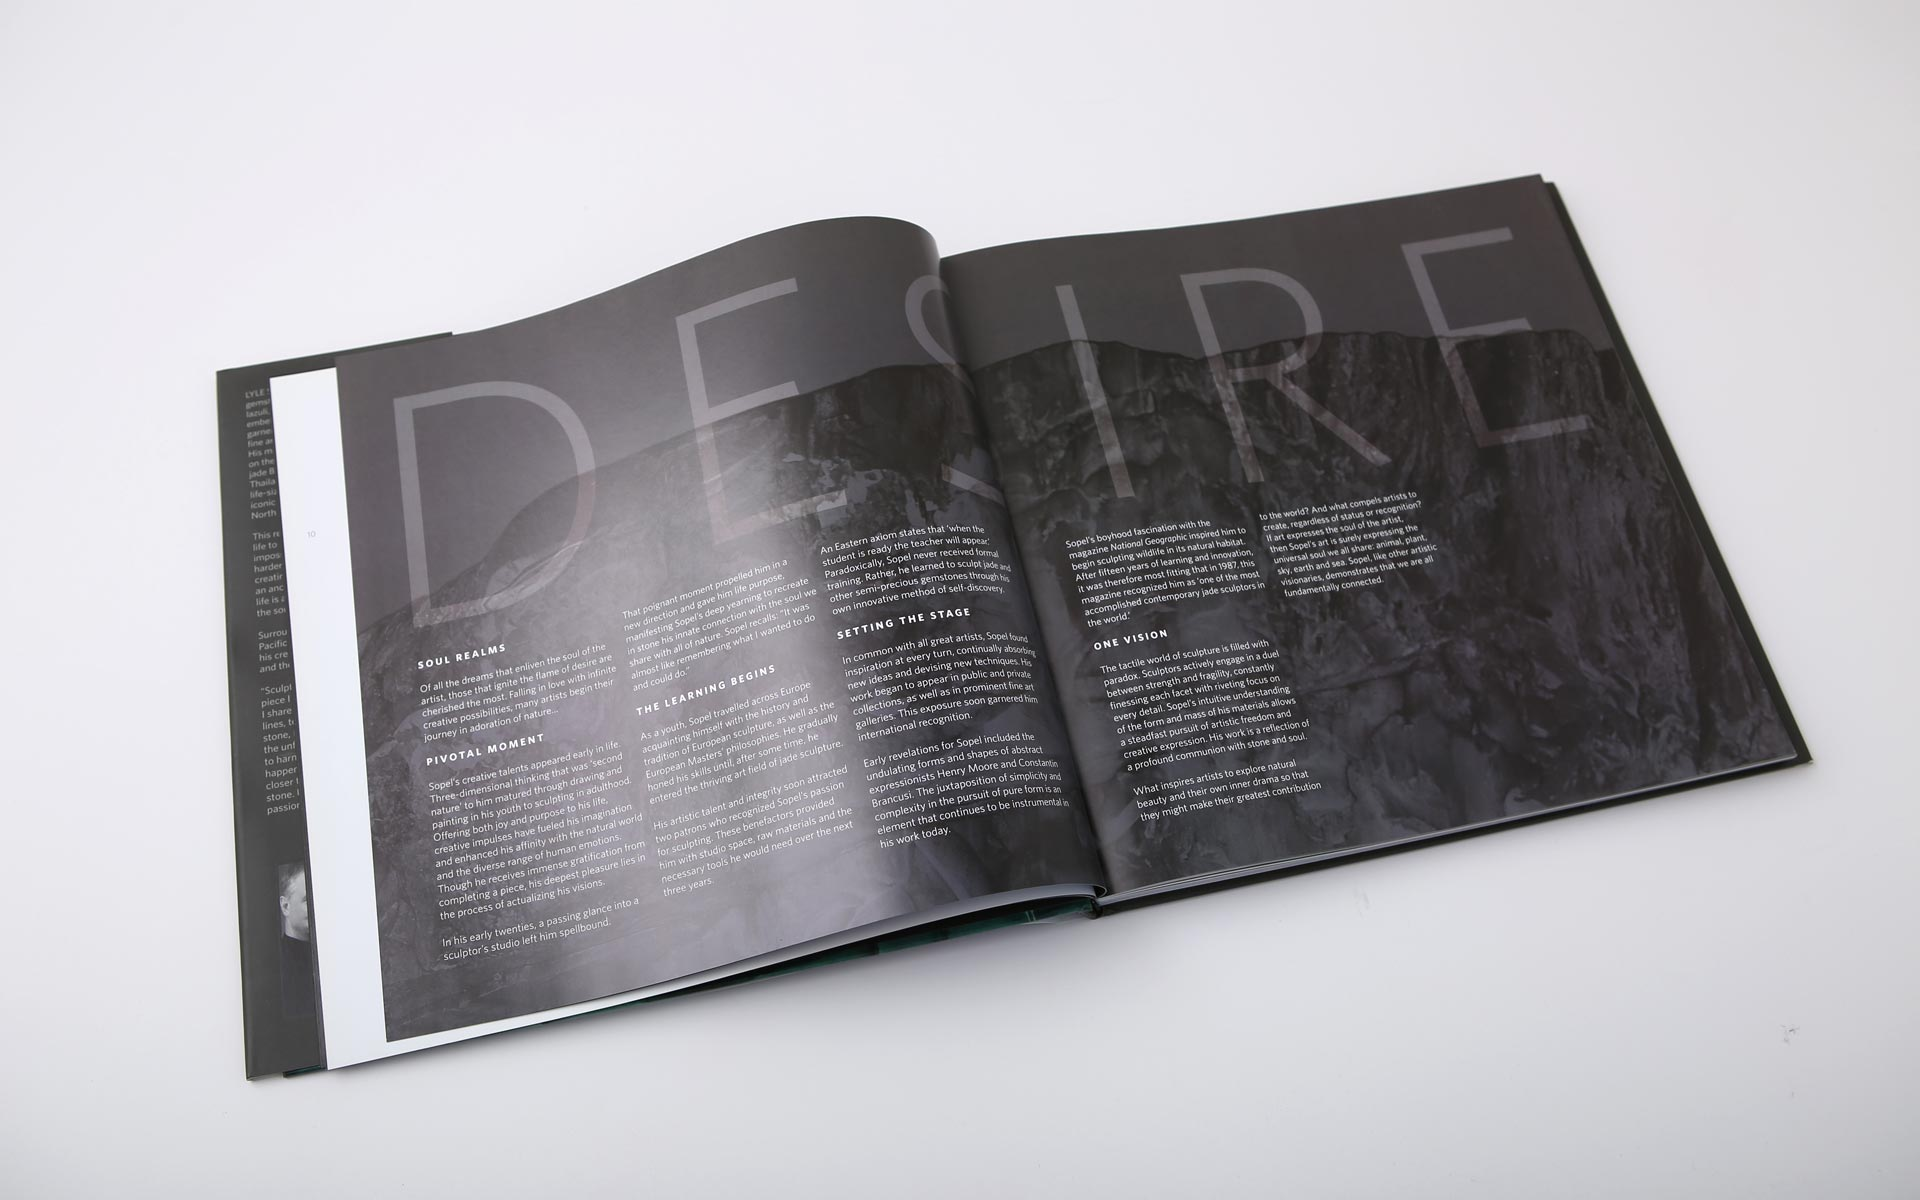 sopel-sculpture-book-design-4